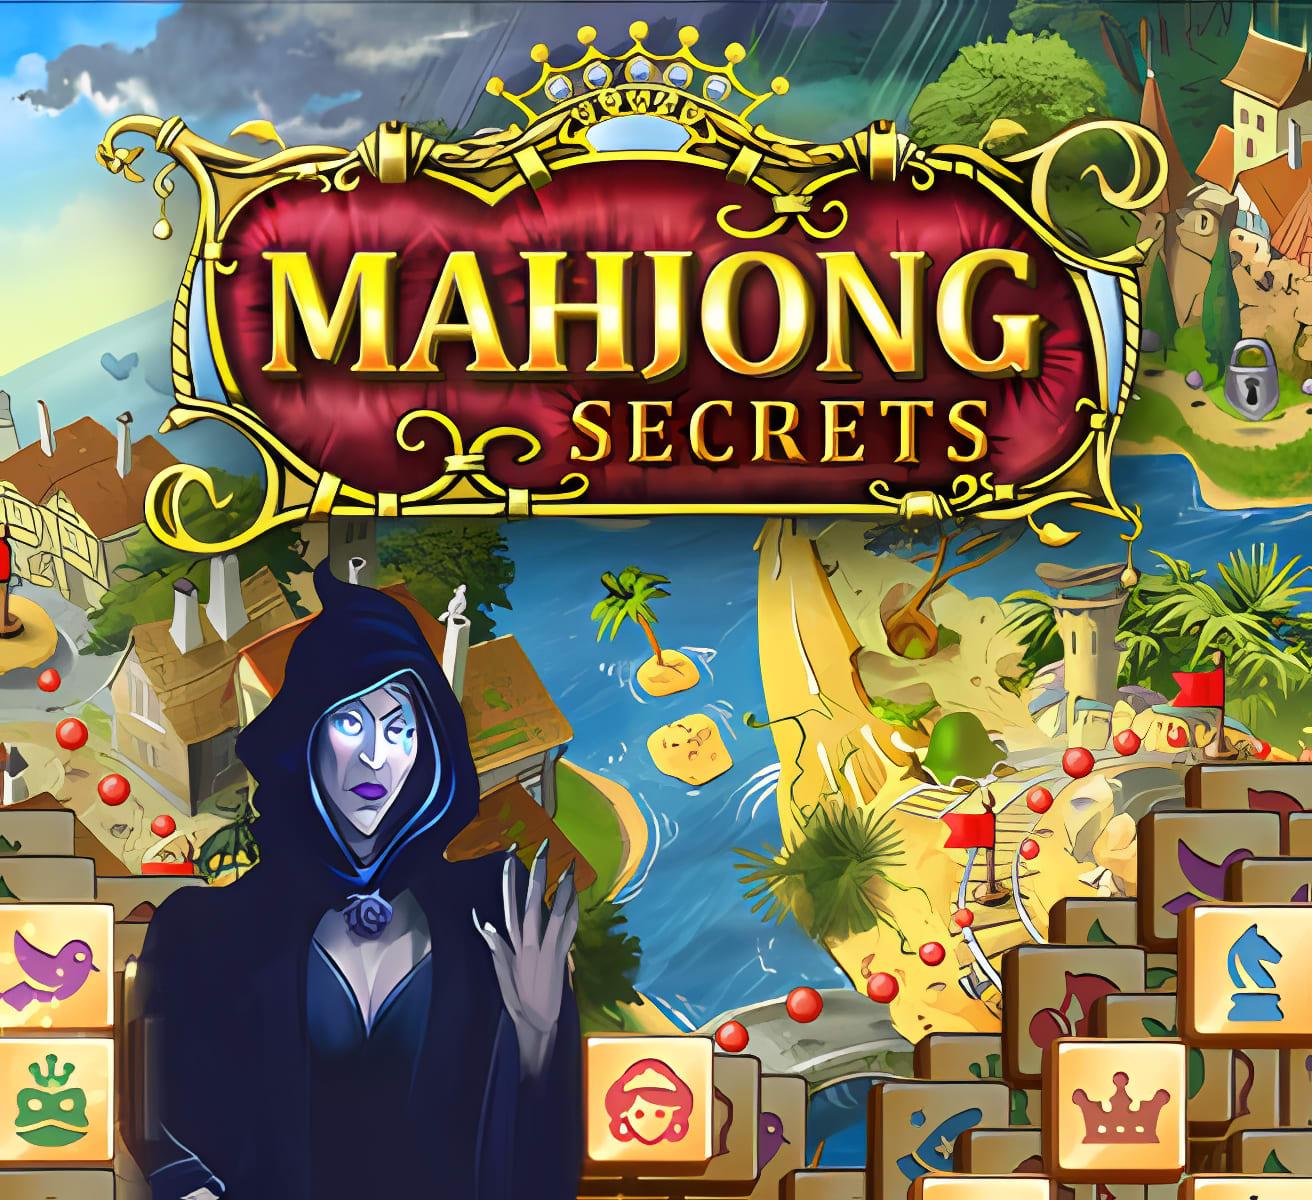 Mahjong Secrets: Die verlorene Schwester 1.0.0.46